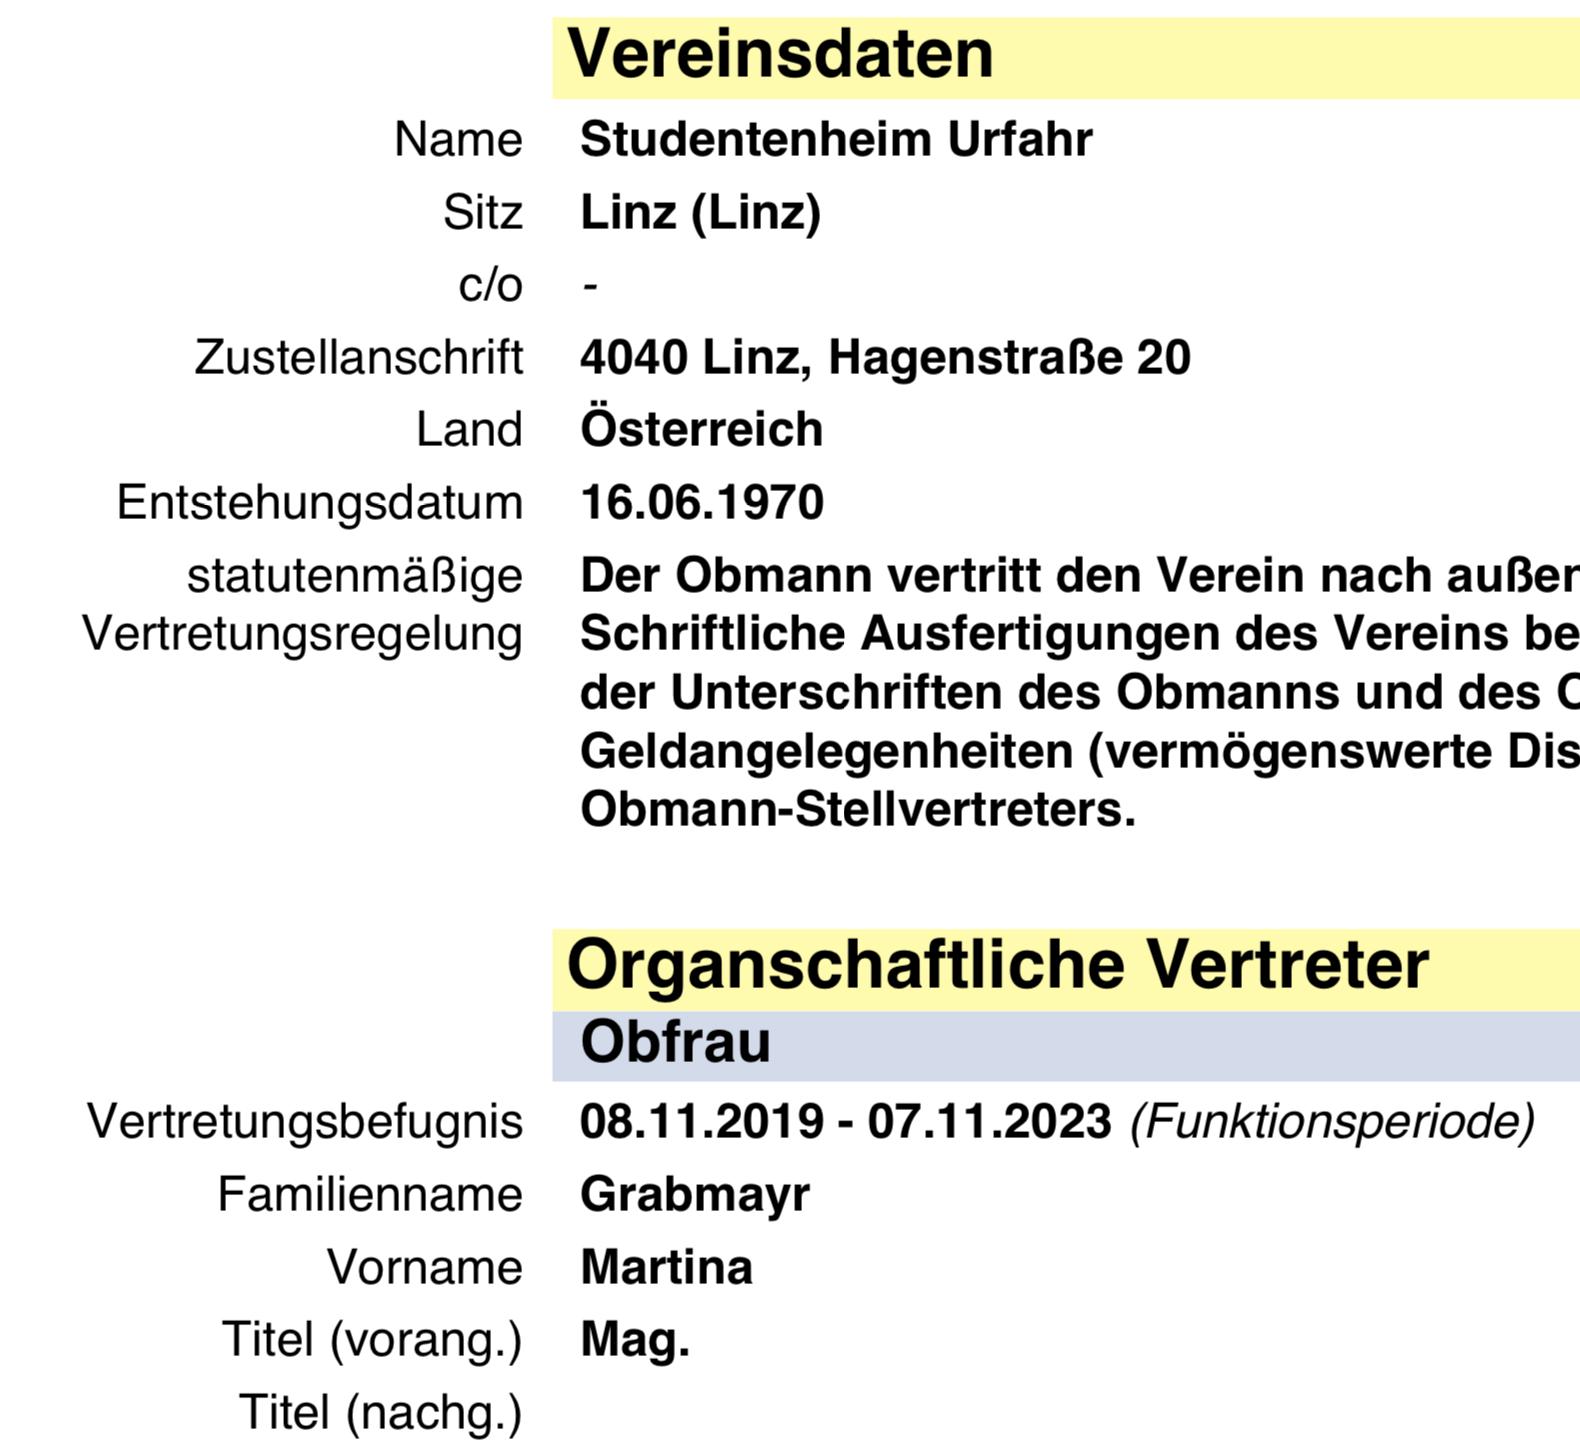 Verein Studentenheim Urfahr: Vereinsobfrau Martina Grabmayr